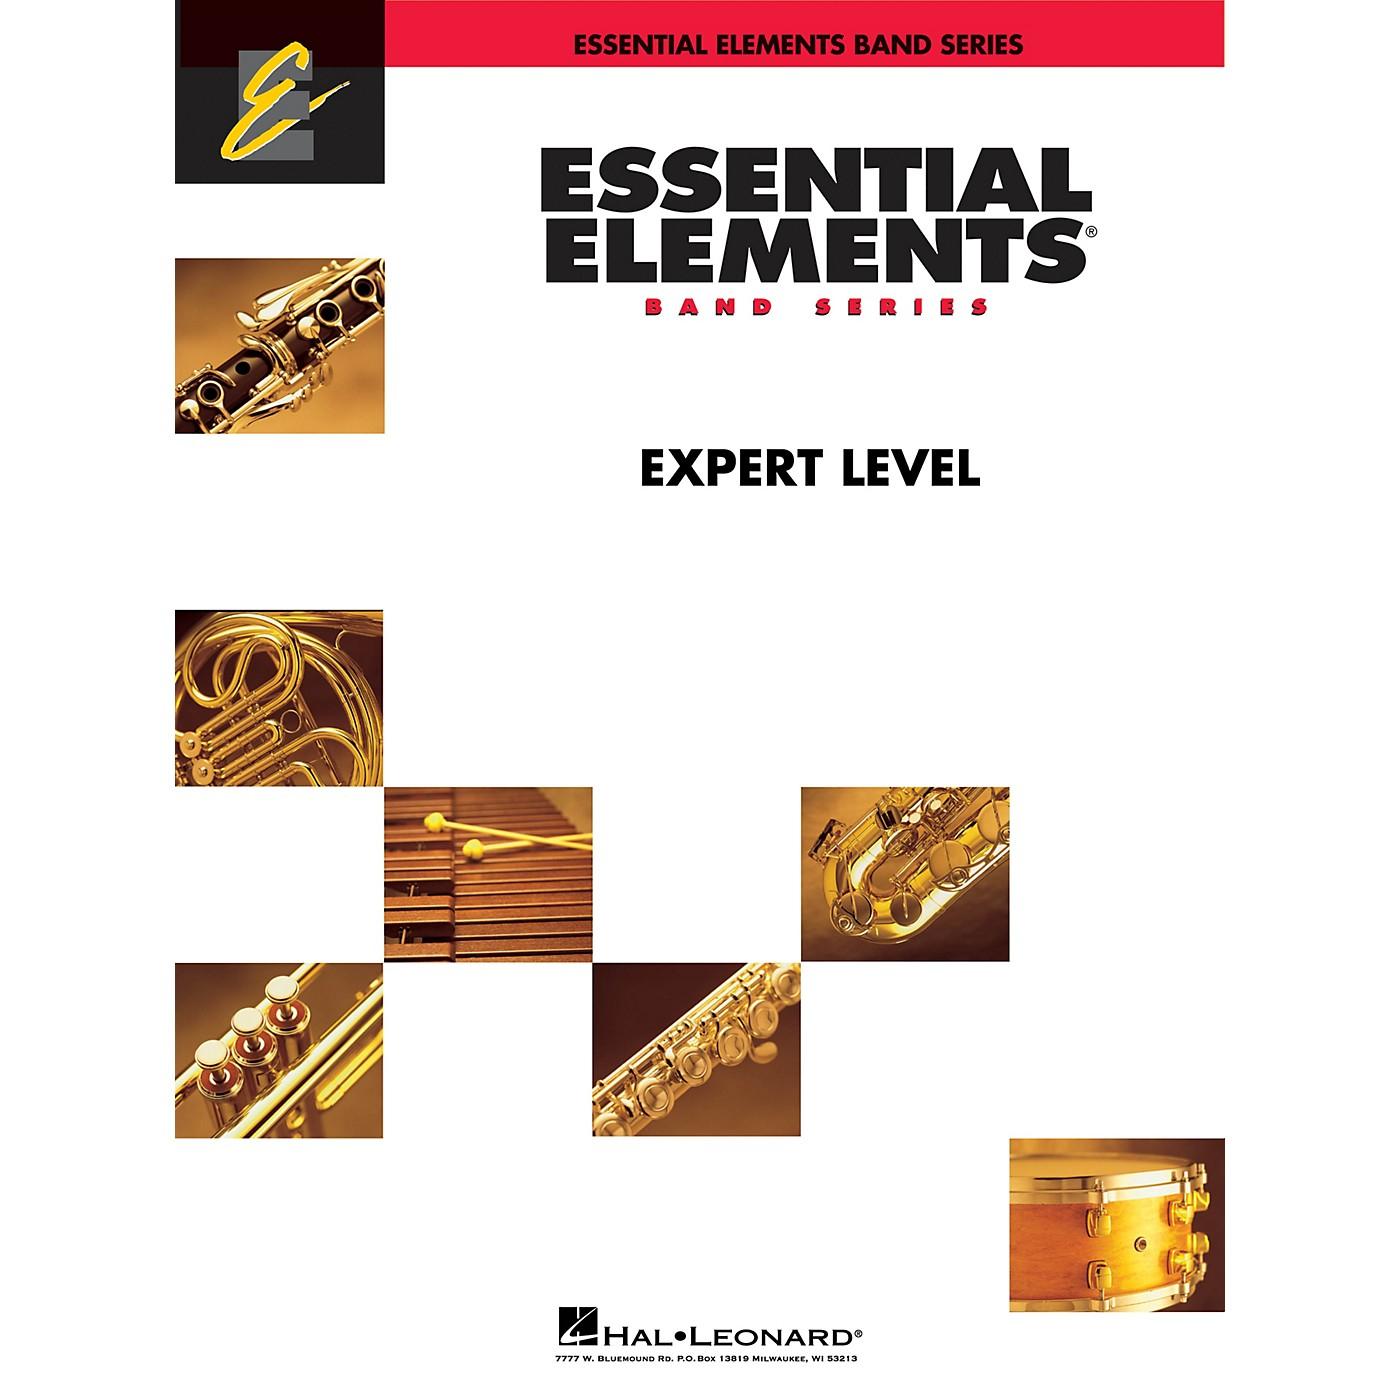 Hal Leonard Adventures Down Under (Includes Full Performance CD) Concert Band Level 2 Arranged by John Higgins thumbnail